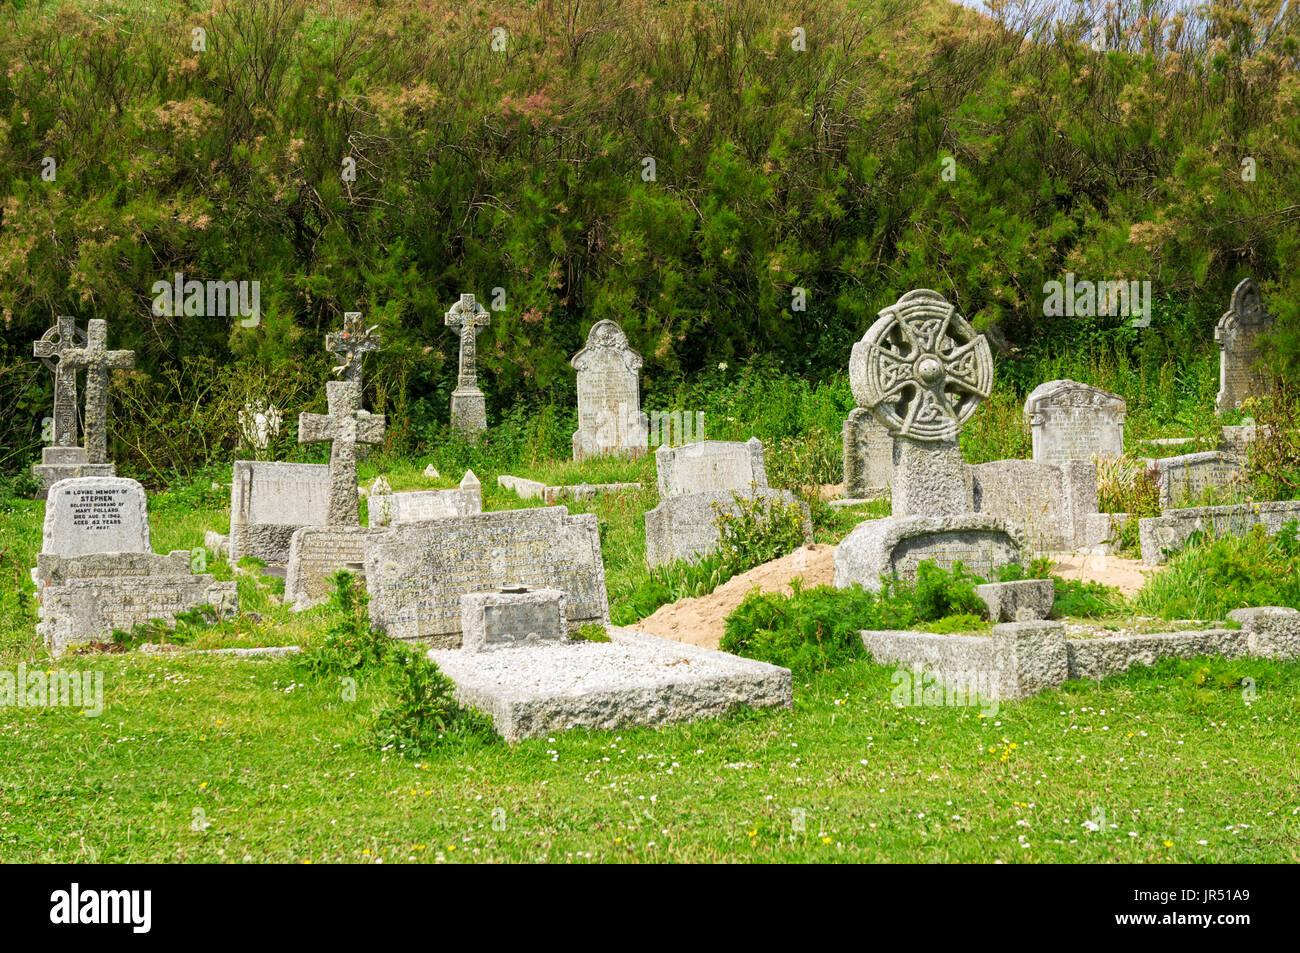 Old gravestones in a churchyard, UK - Stock Image